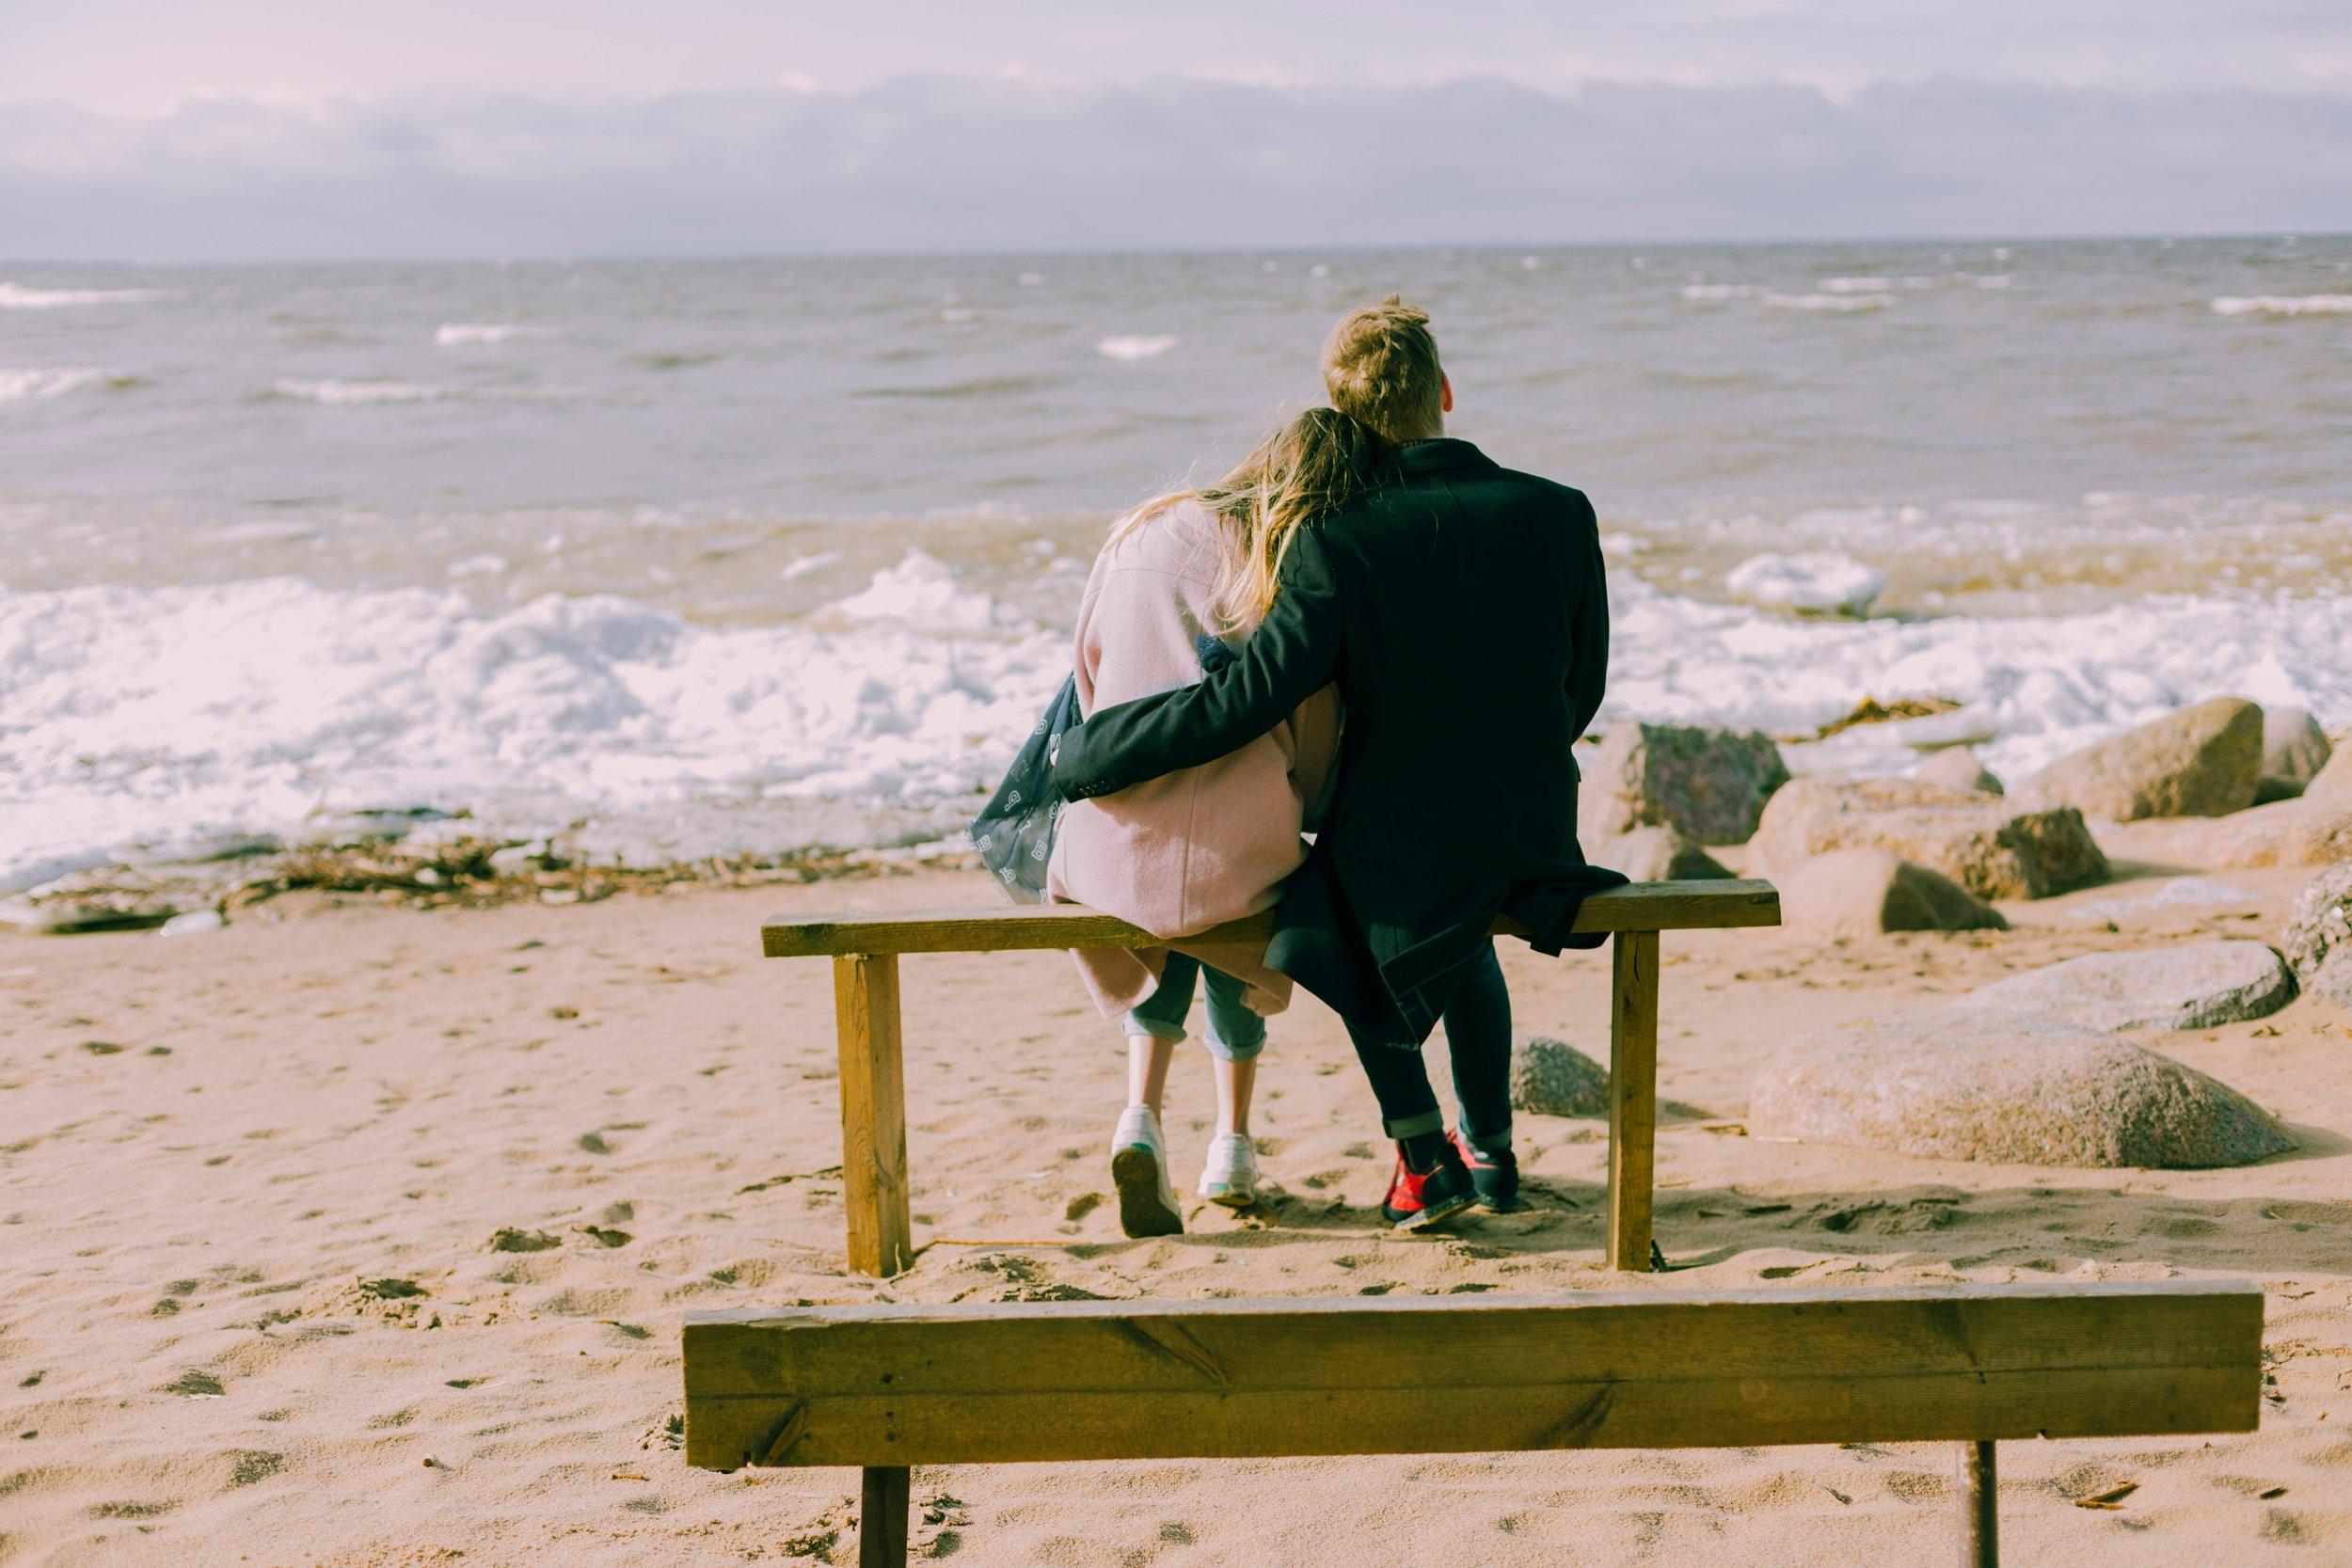 beach-bench-couple-698882.jpg